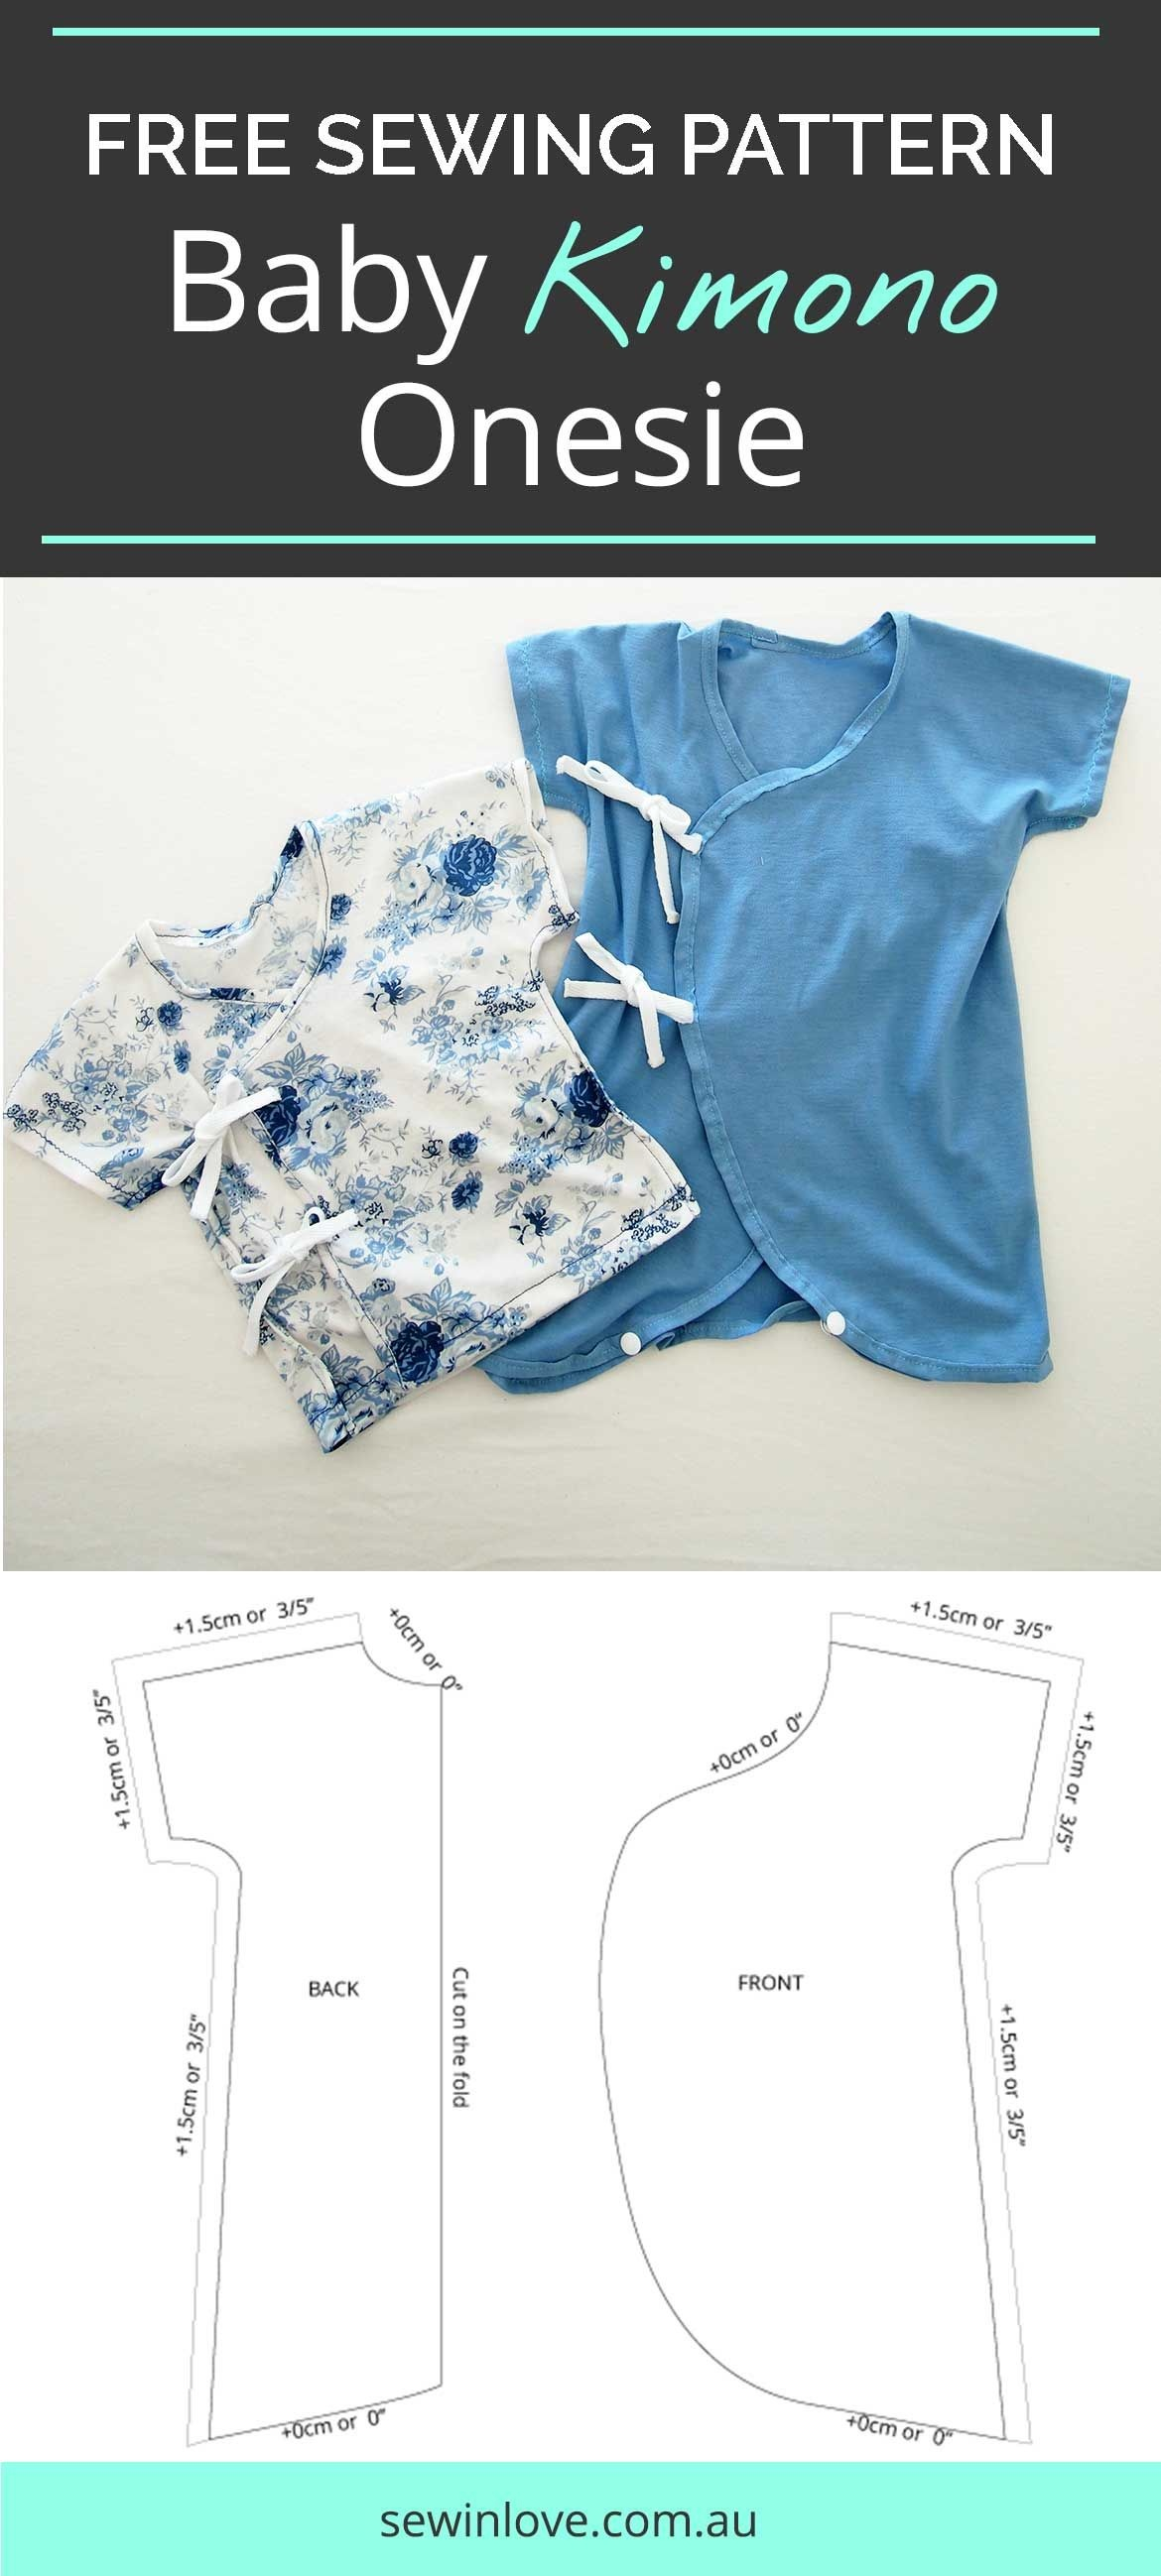 Another Baby Kimono Sewing Pattern - Onesie Version | Sewing - Free Printable Onesie Pattern